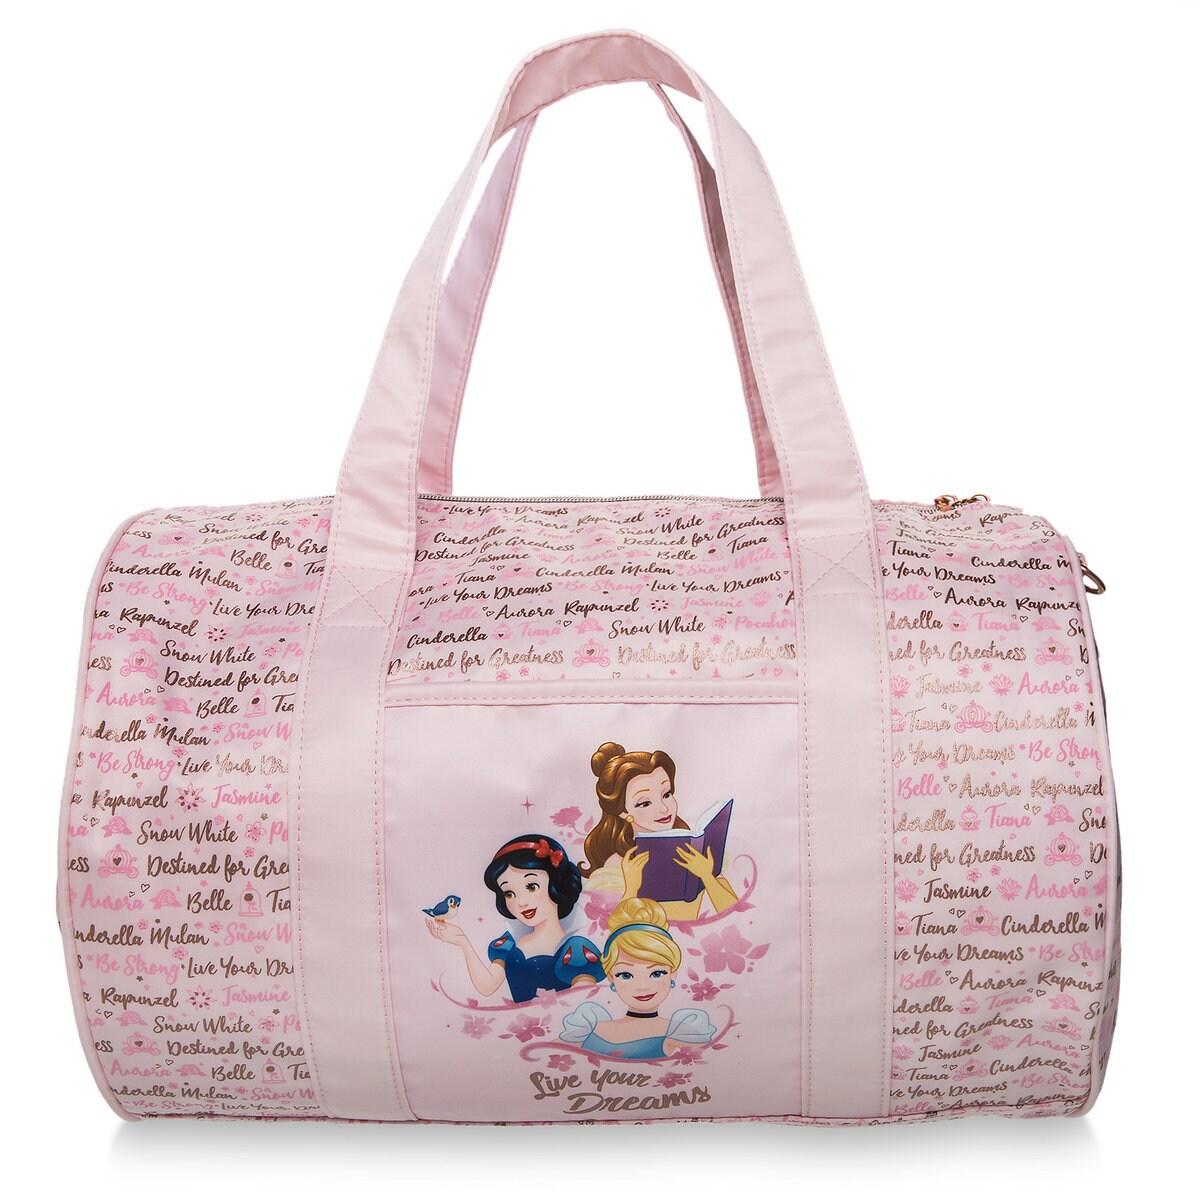 d1c7f1ec336 Product Image of Disney Princess Dance Bag   1